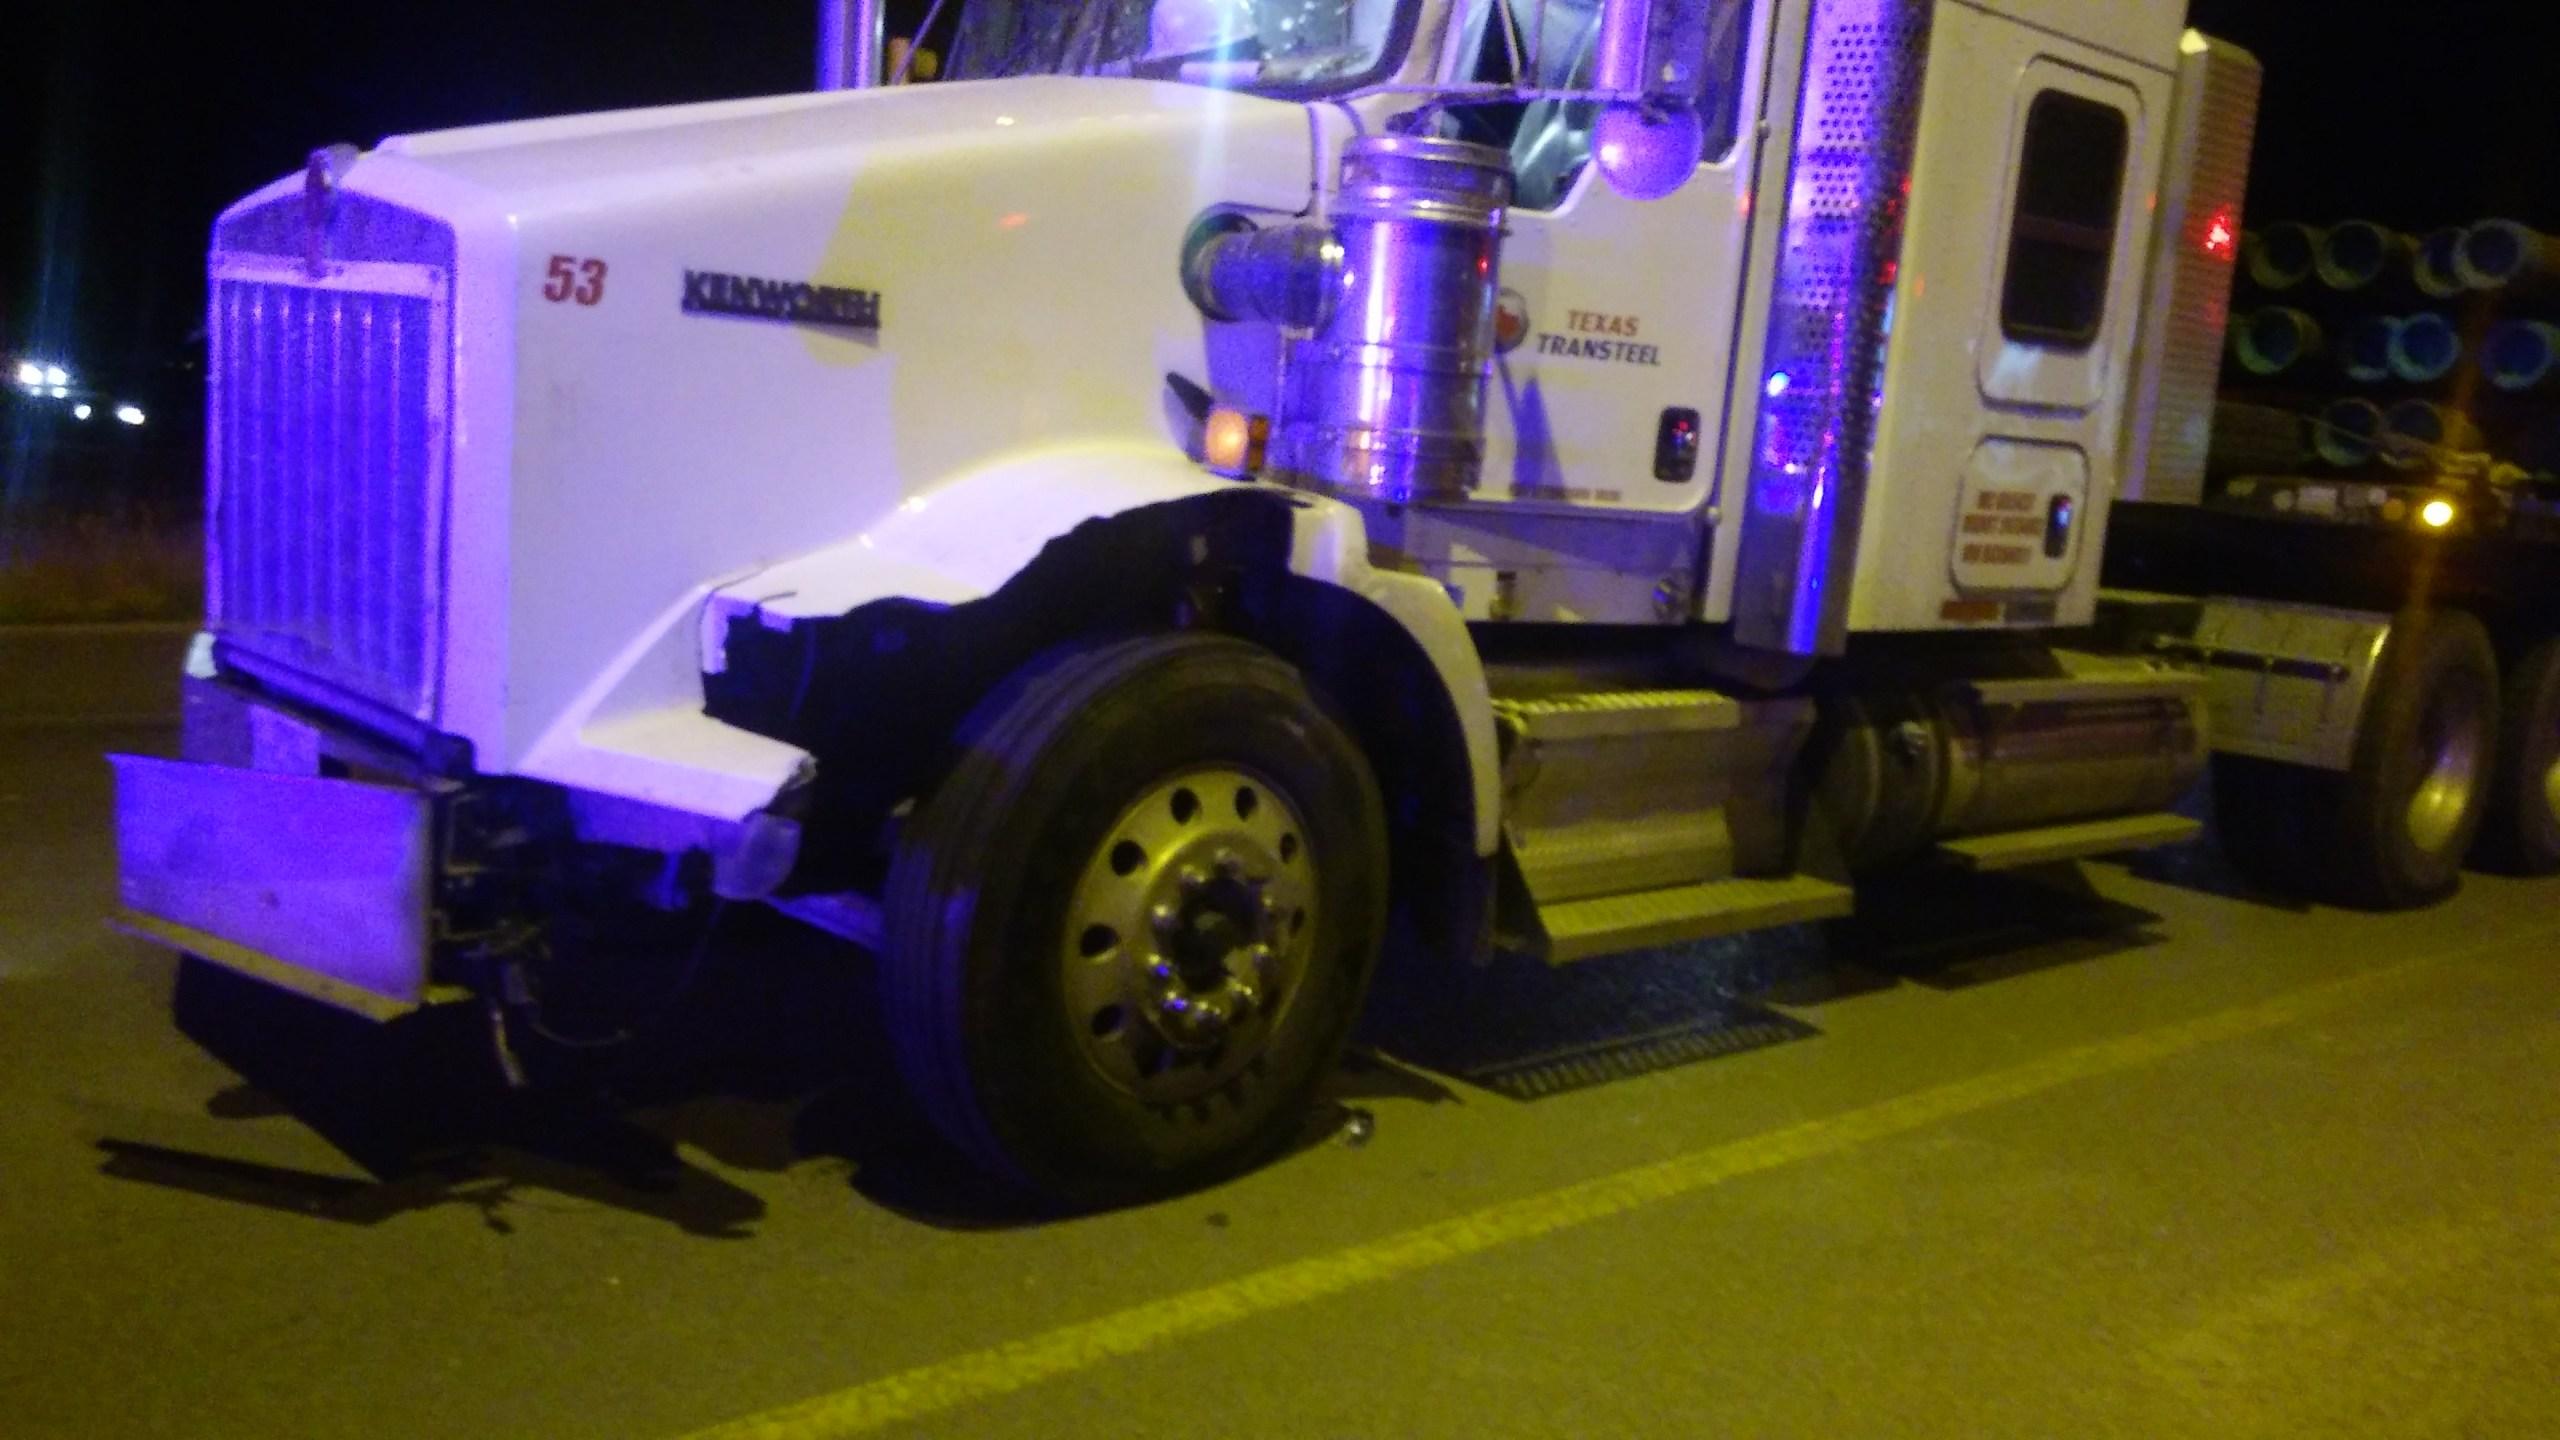 Semi Truck and Ambulance Collide in Rollover Accident